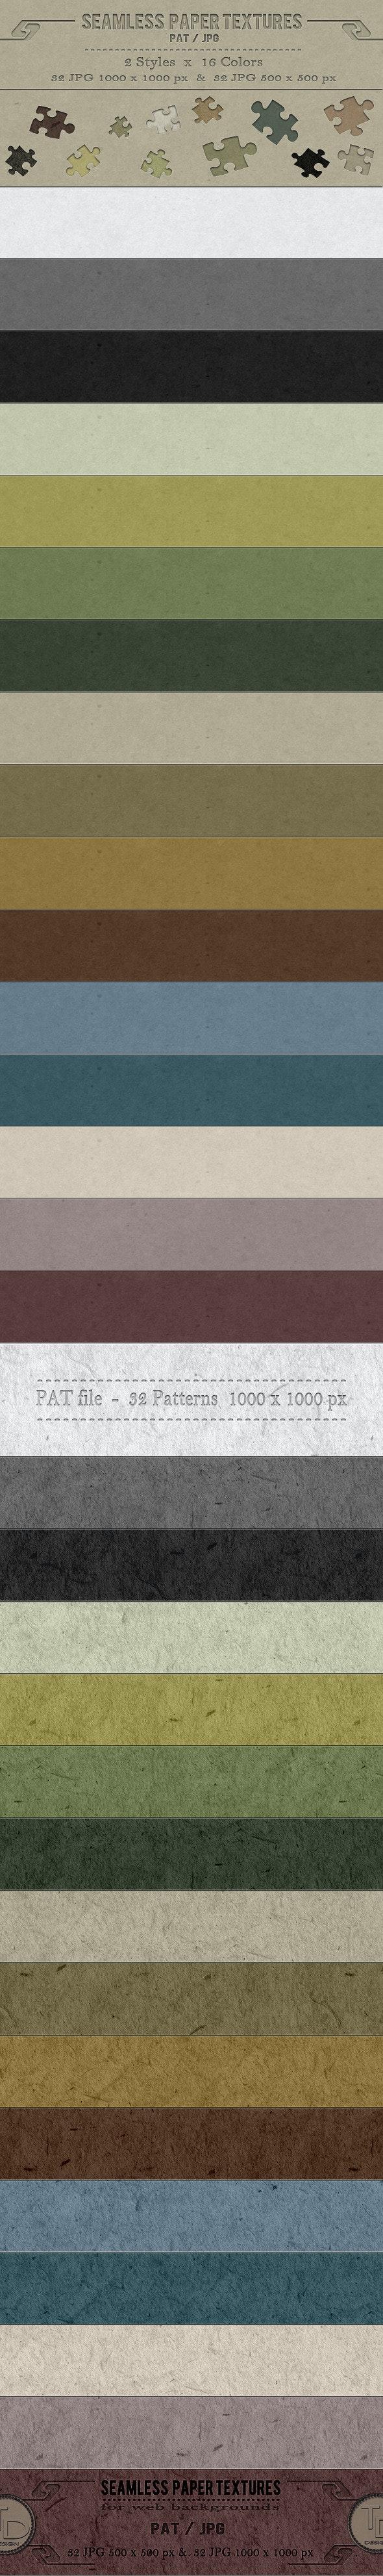 Seamless Paper Textures - Textures / Fills / Patterns Photoshop